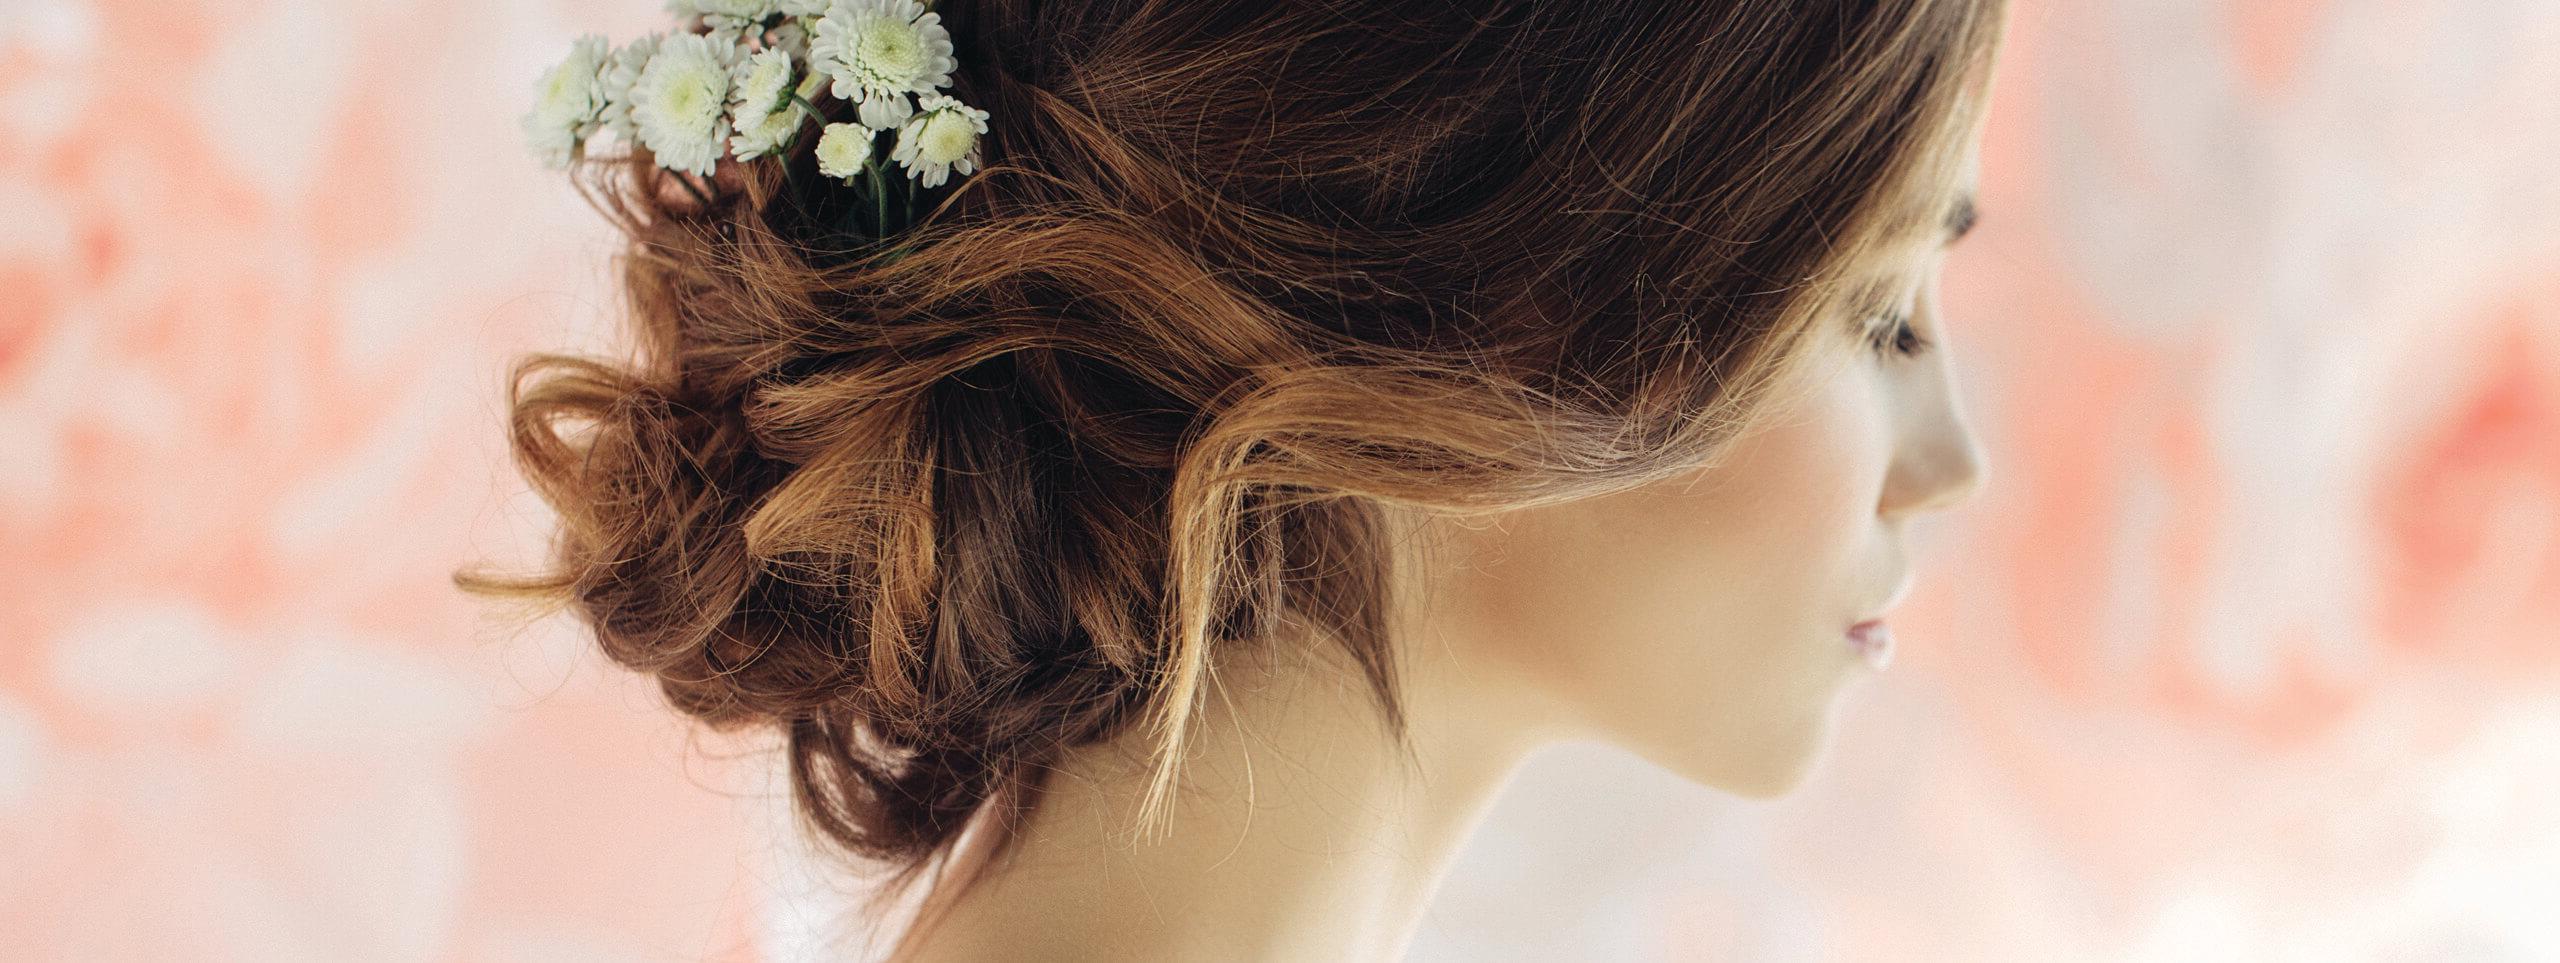 Fashionable Wedding Medium Hairstyles Pertaining To Wedding Hairstyles For Medium Hair (View 13 of 20)